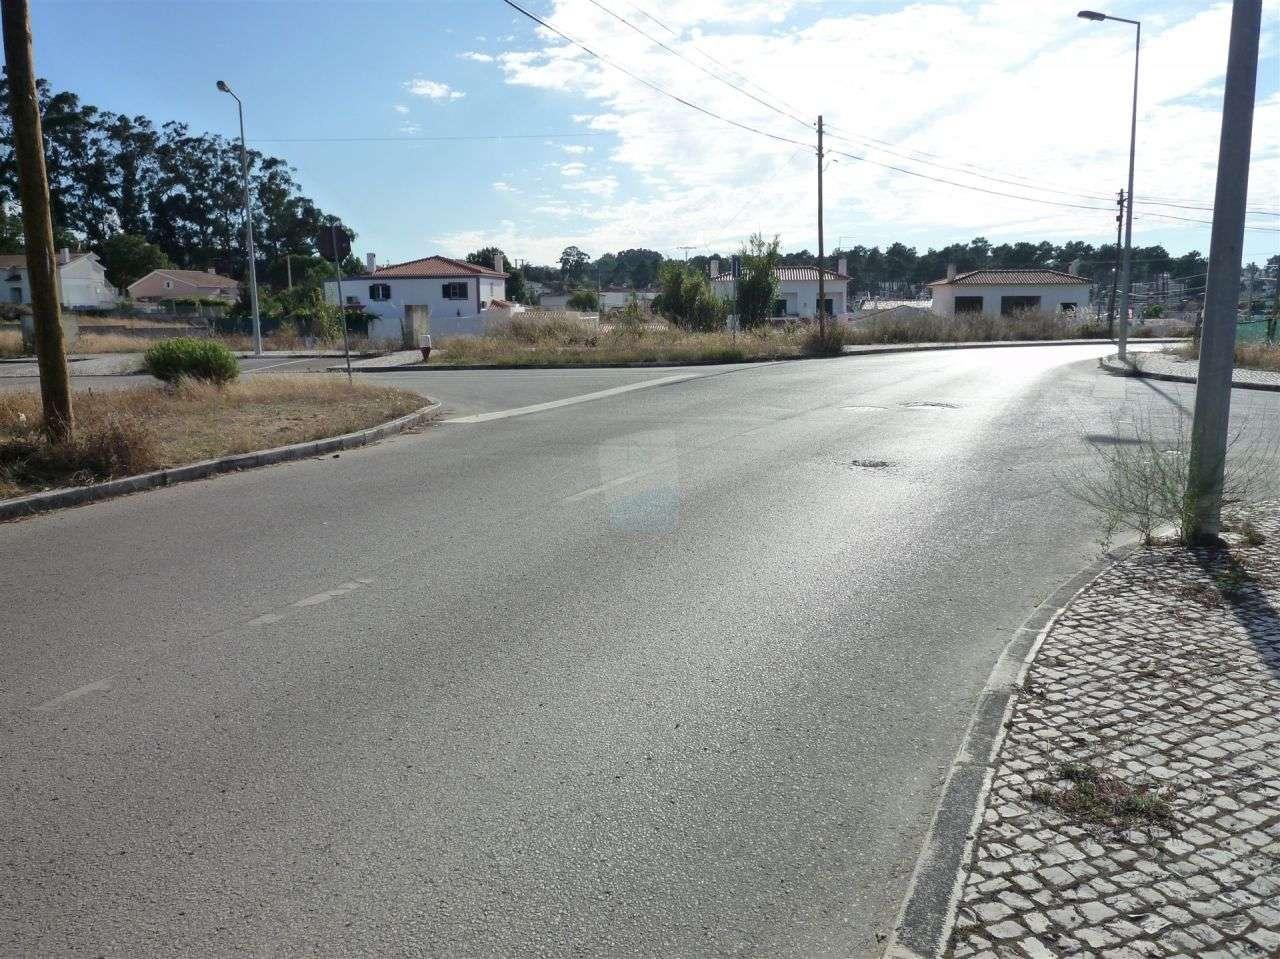 Terreno para comprar, Castelo (Sesimbra), Setúbal - Foto 13